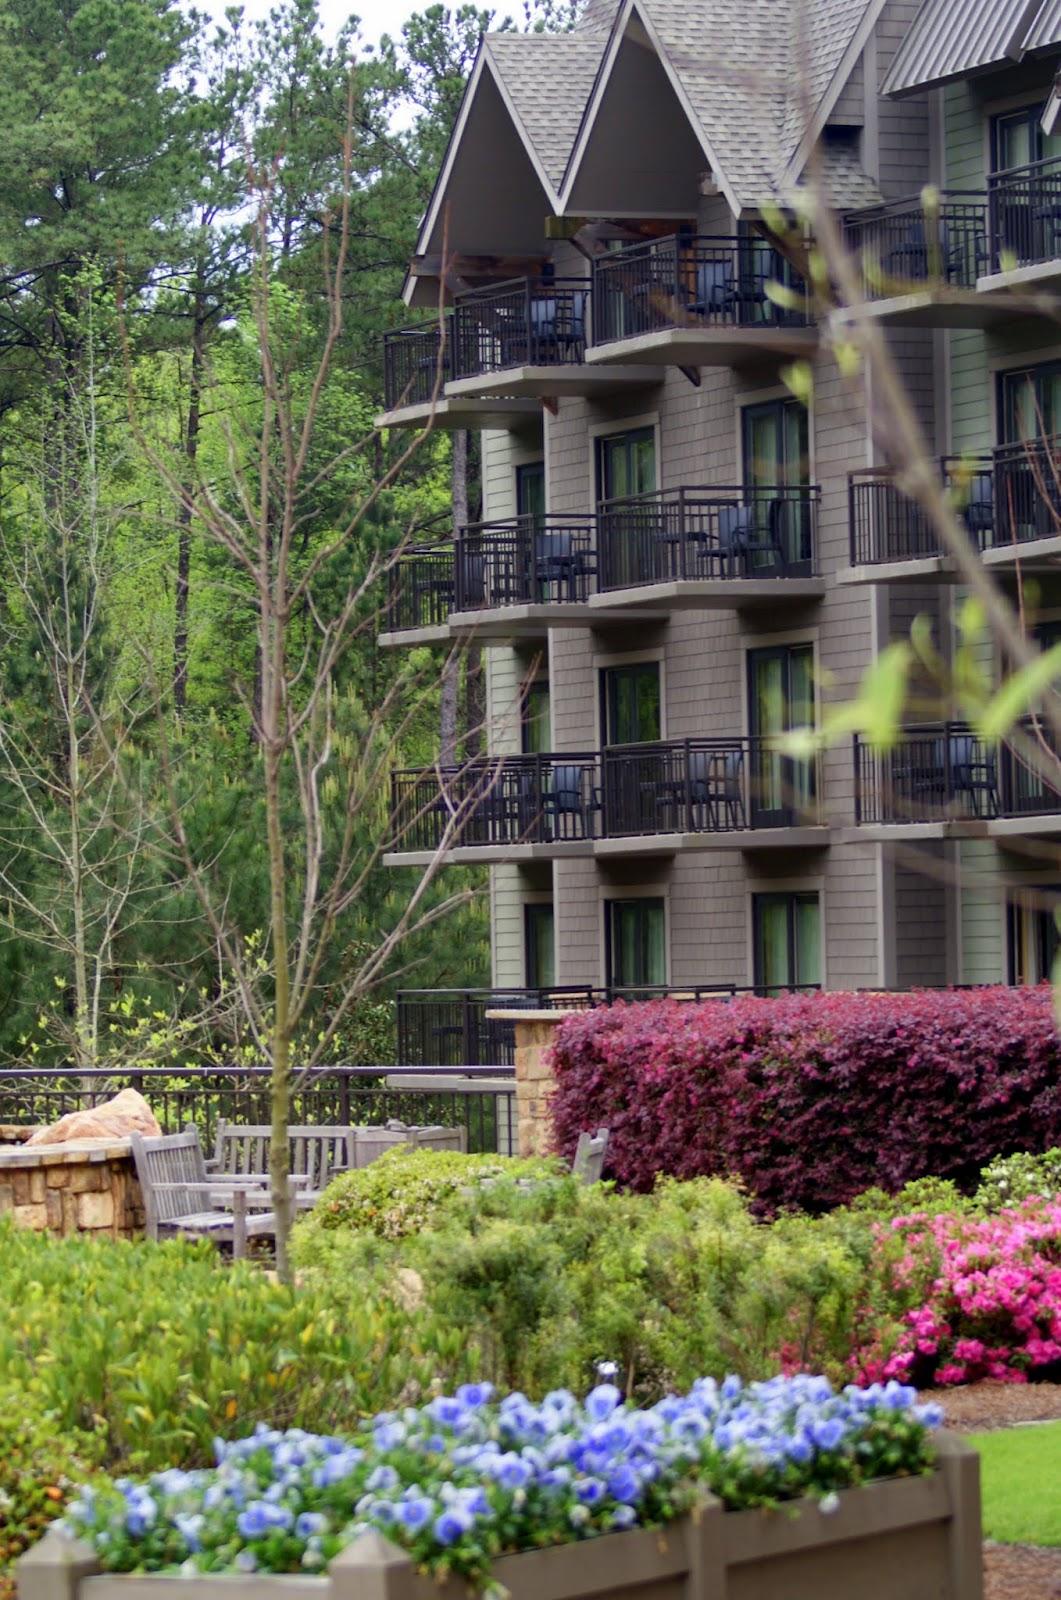 nc gardens en asheville hotel garden image motel in exterior hotels motels callaway com near